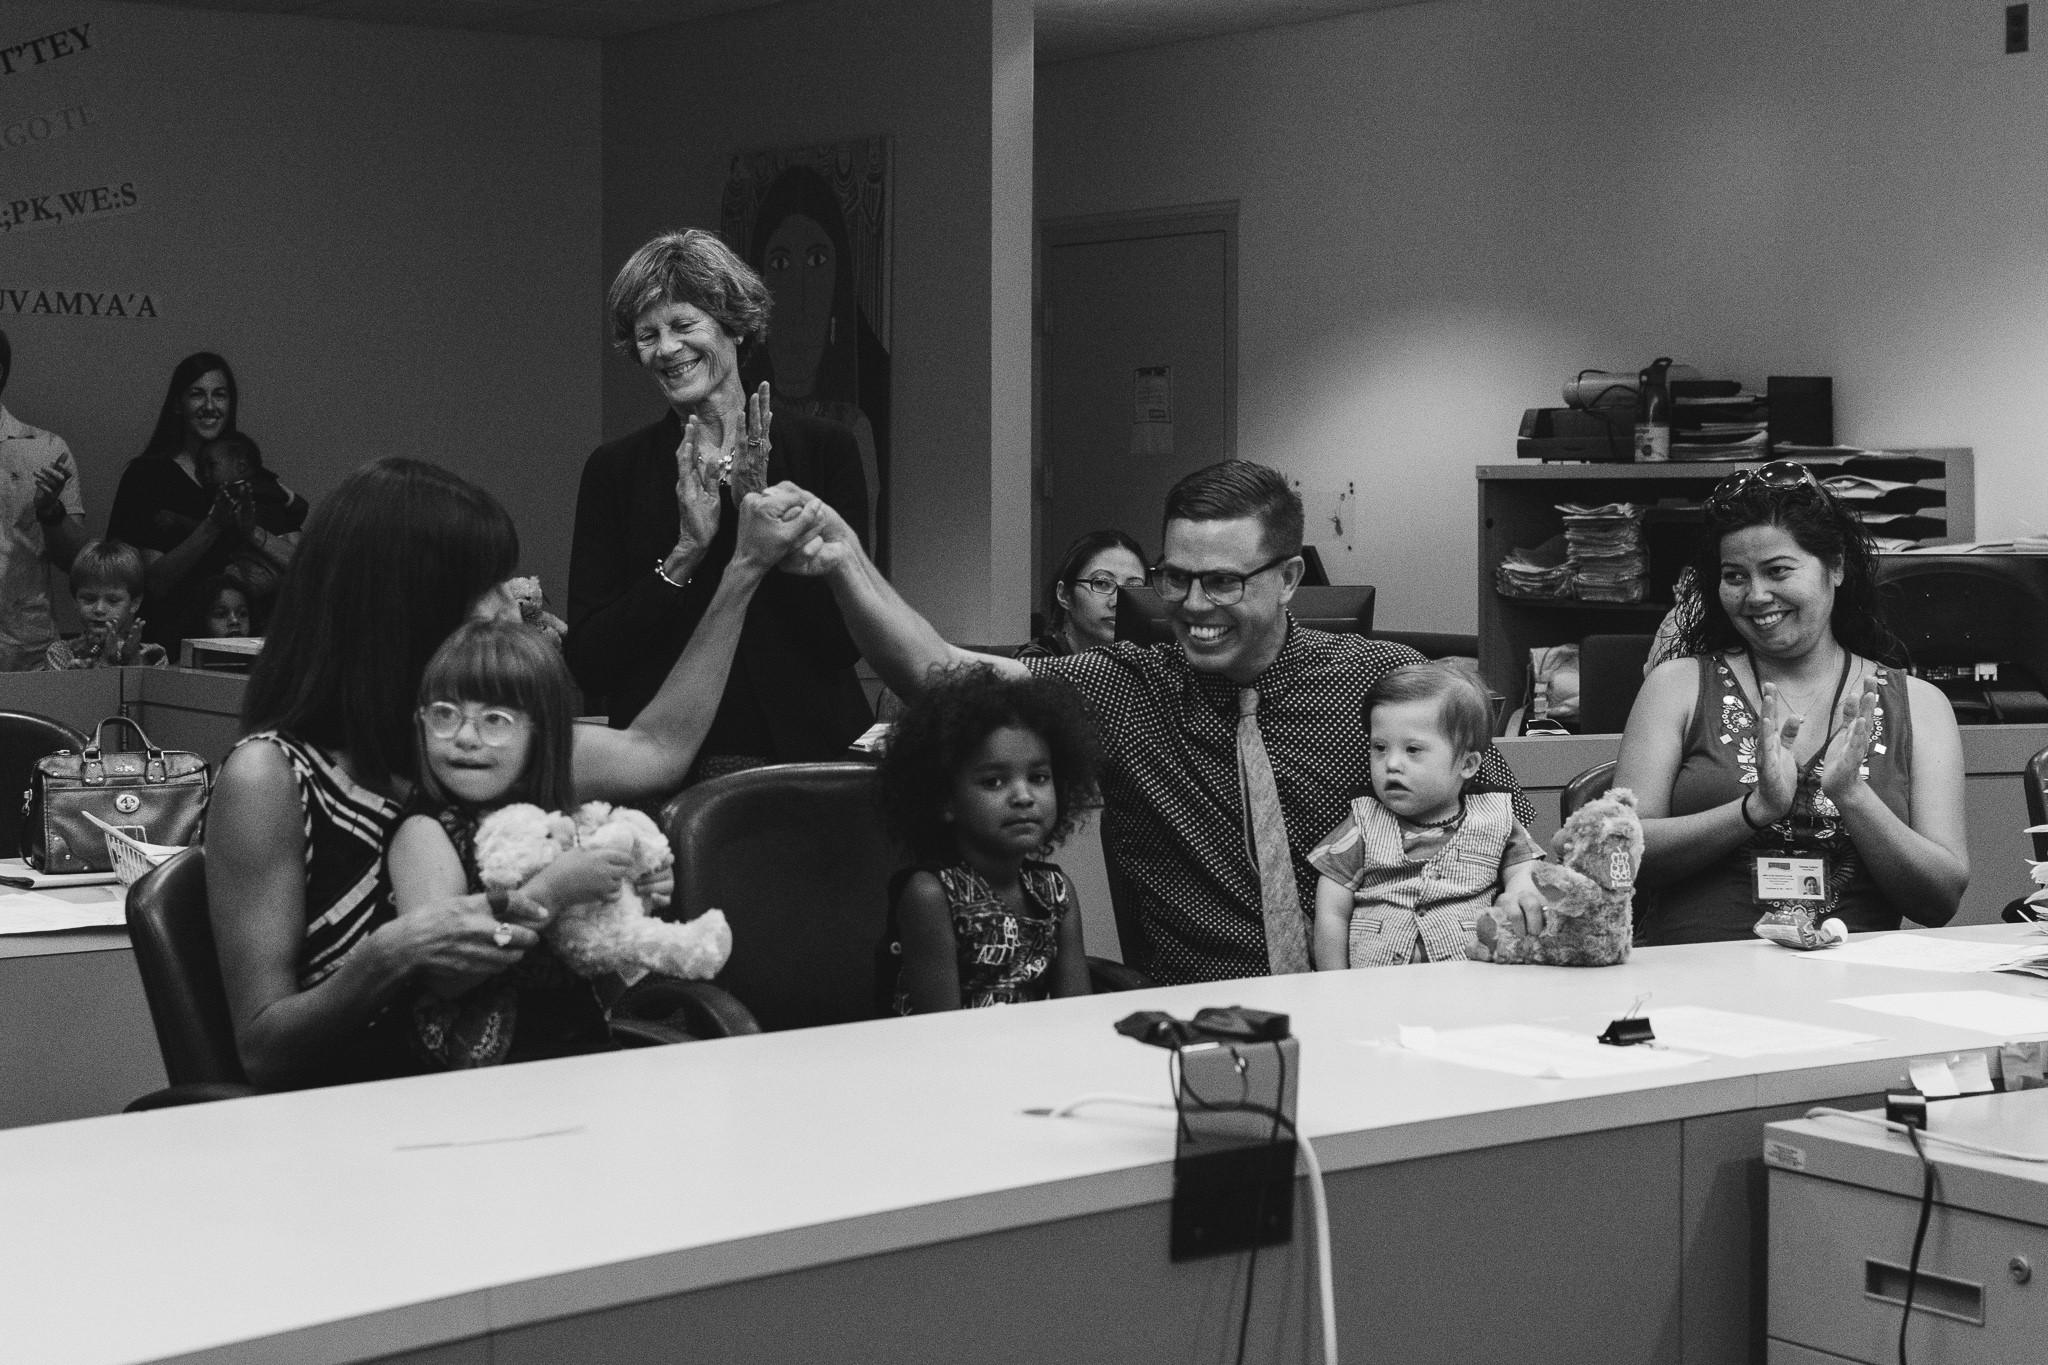 courthouse adoption documentary family photography